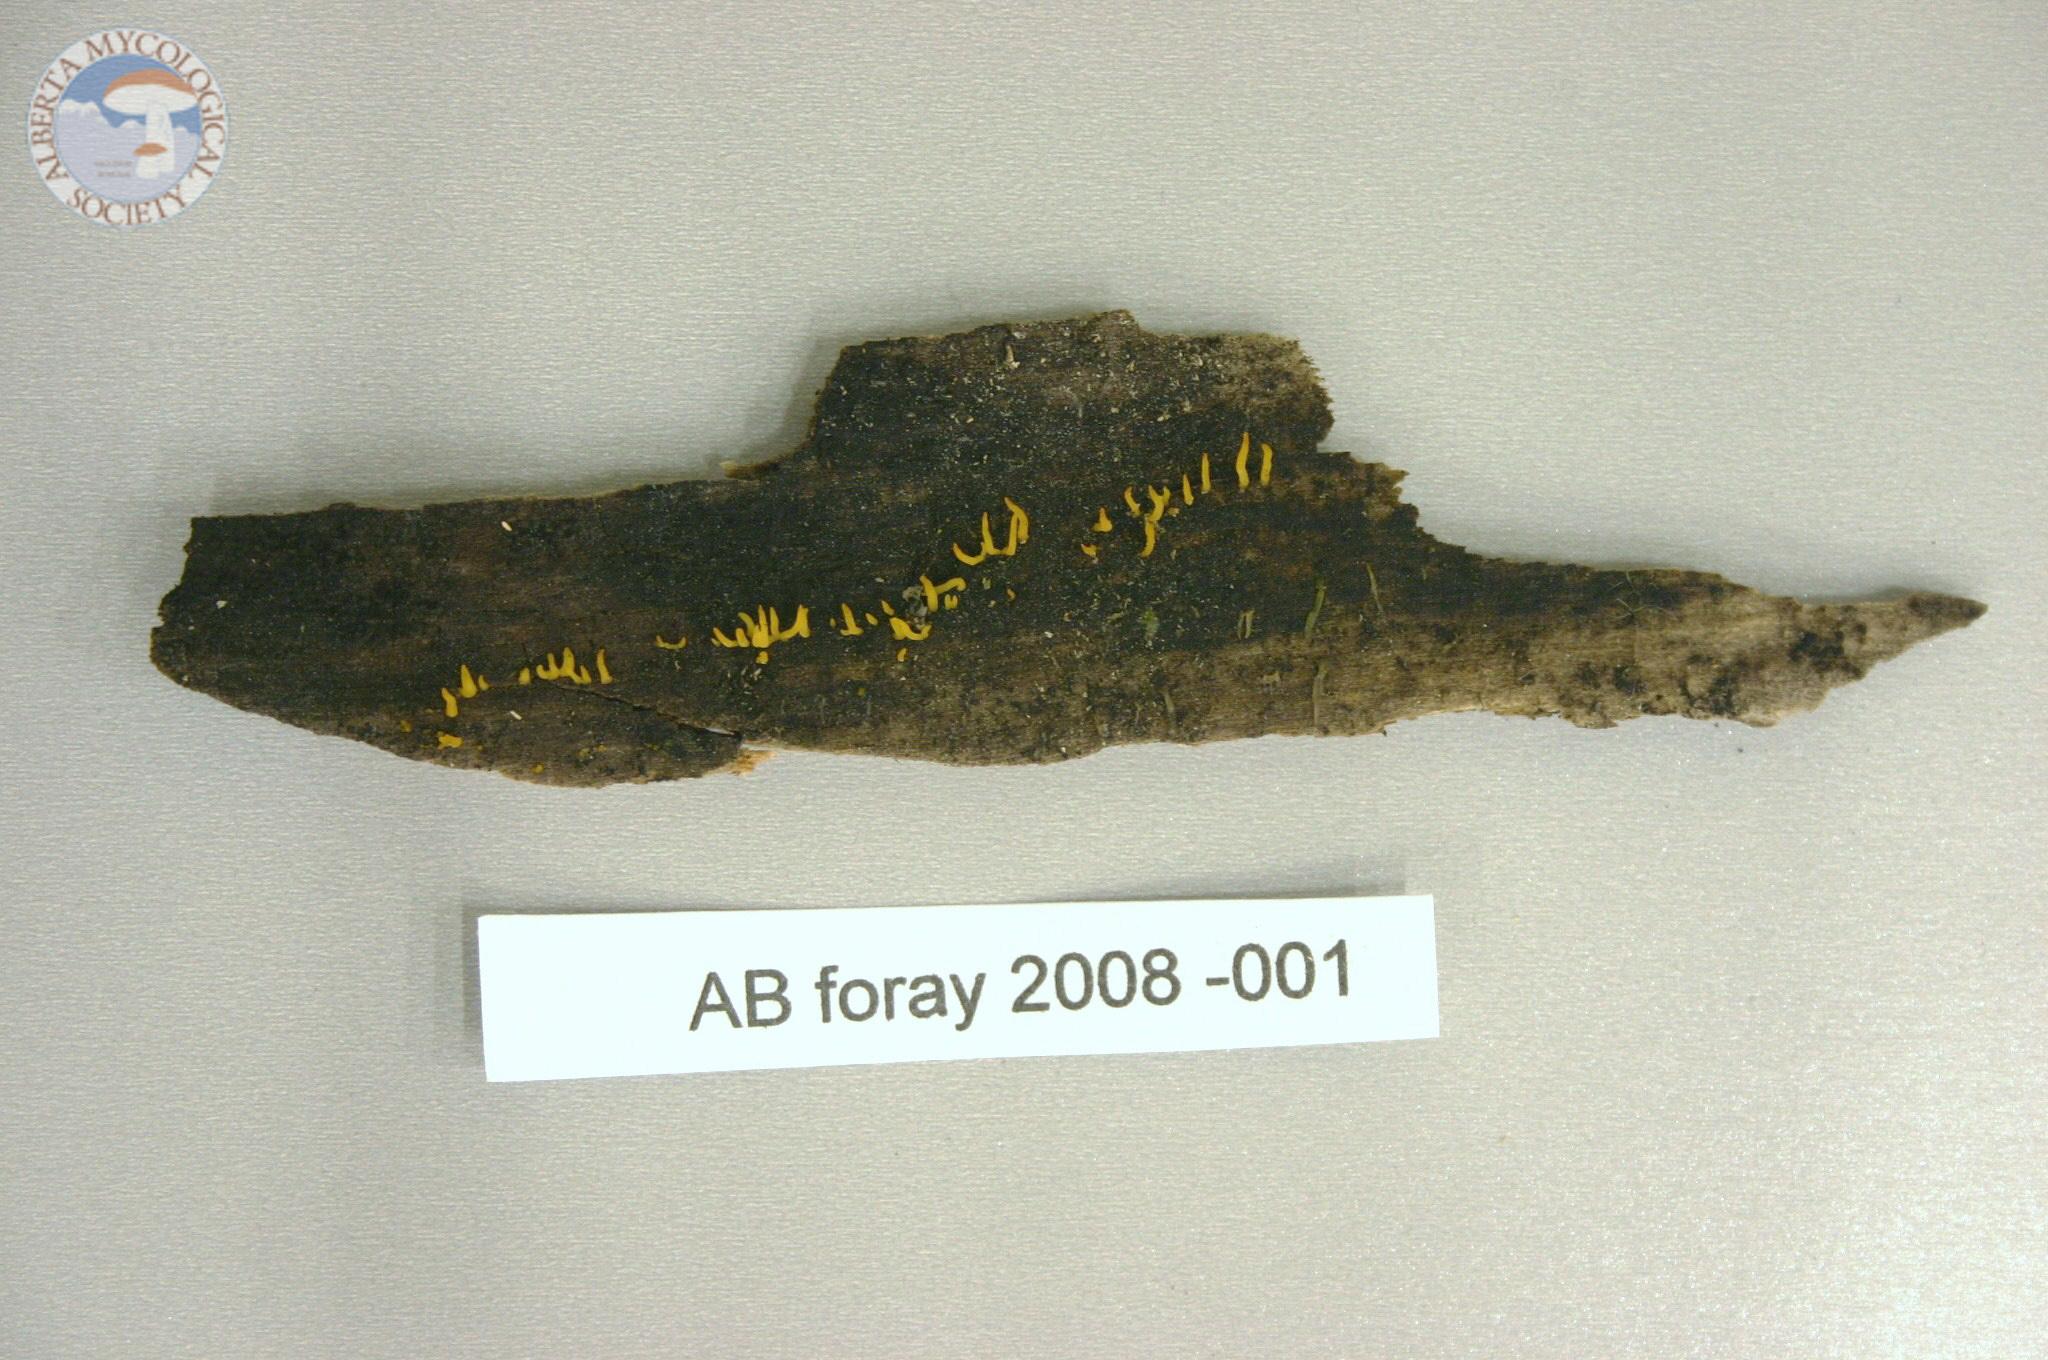 Alberta Foray 2008